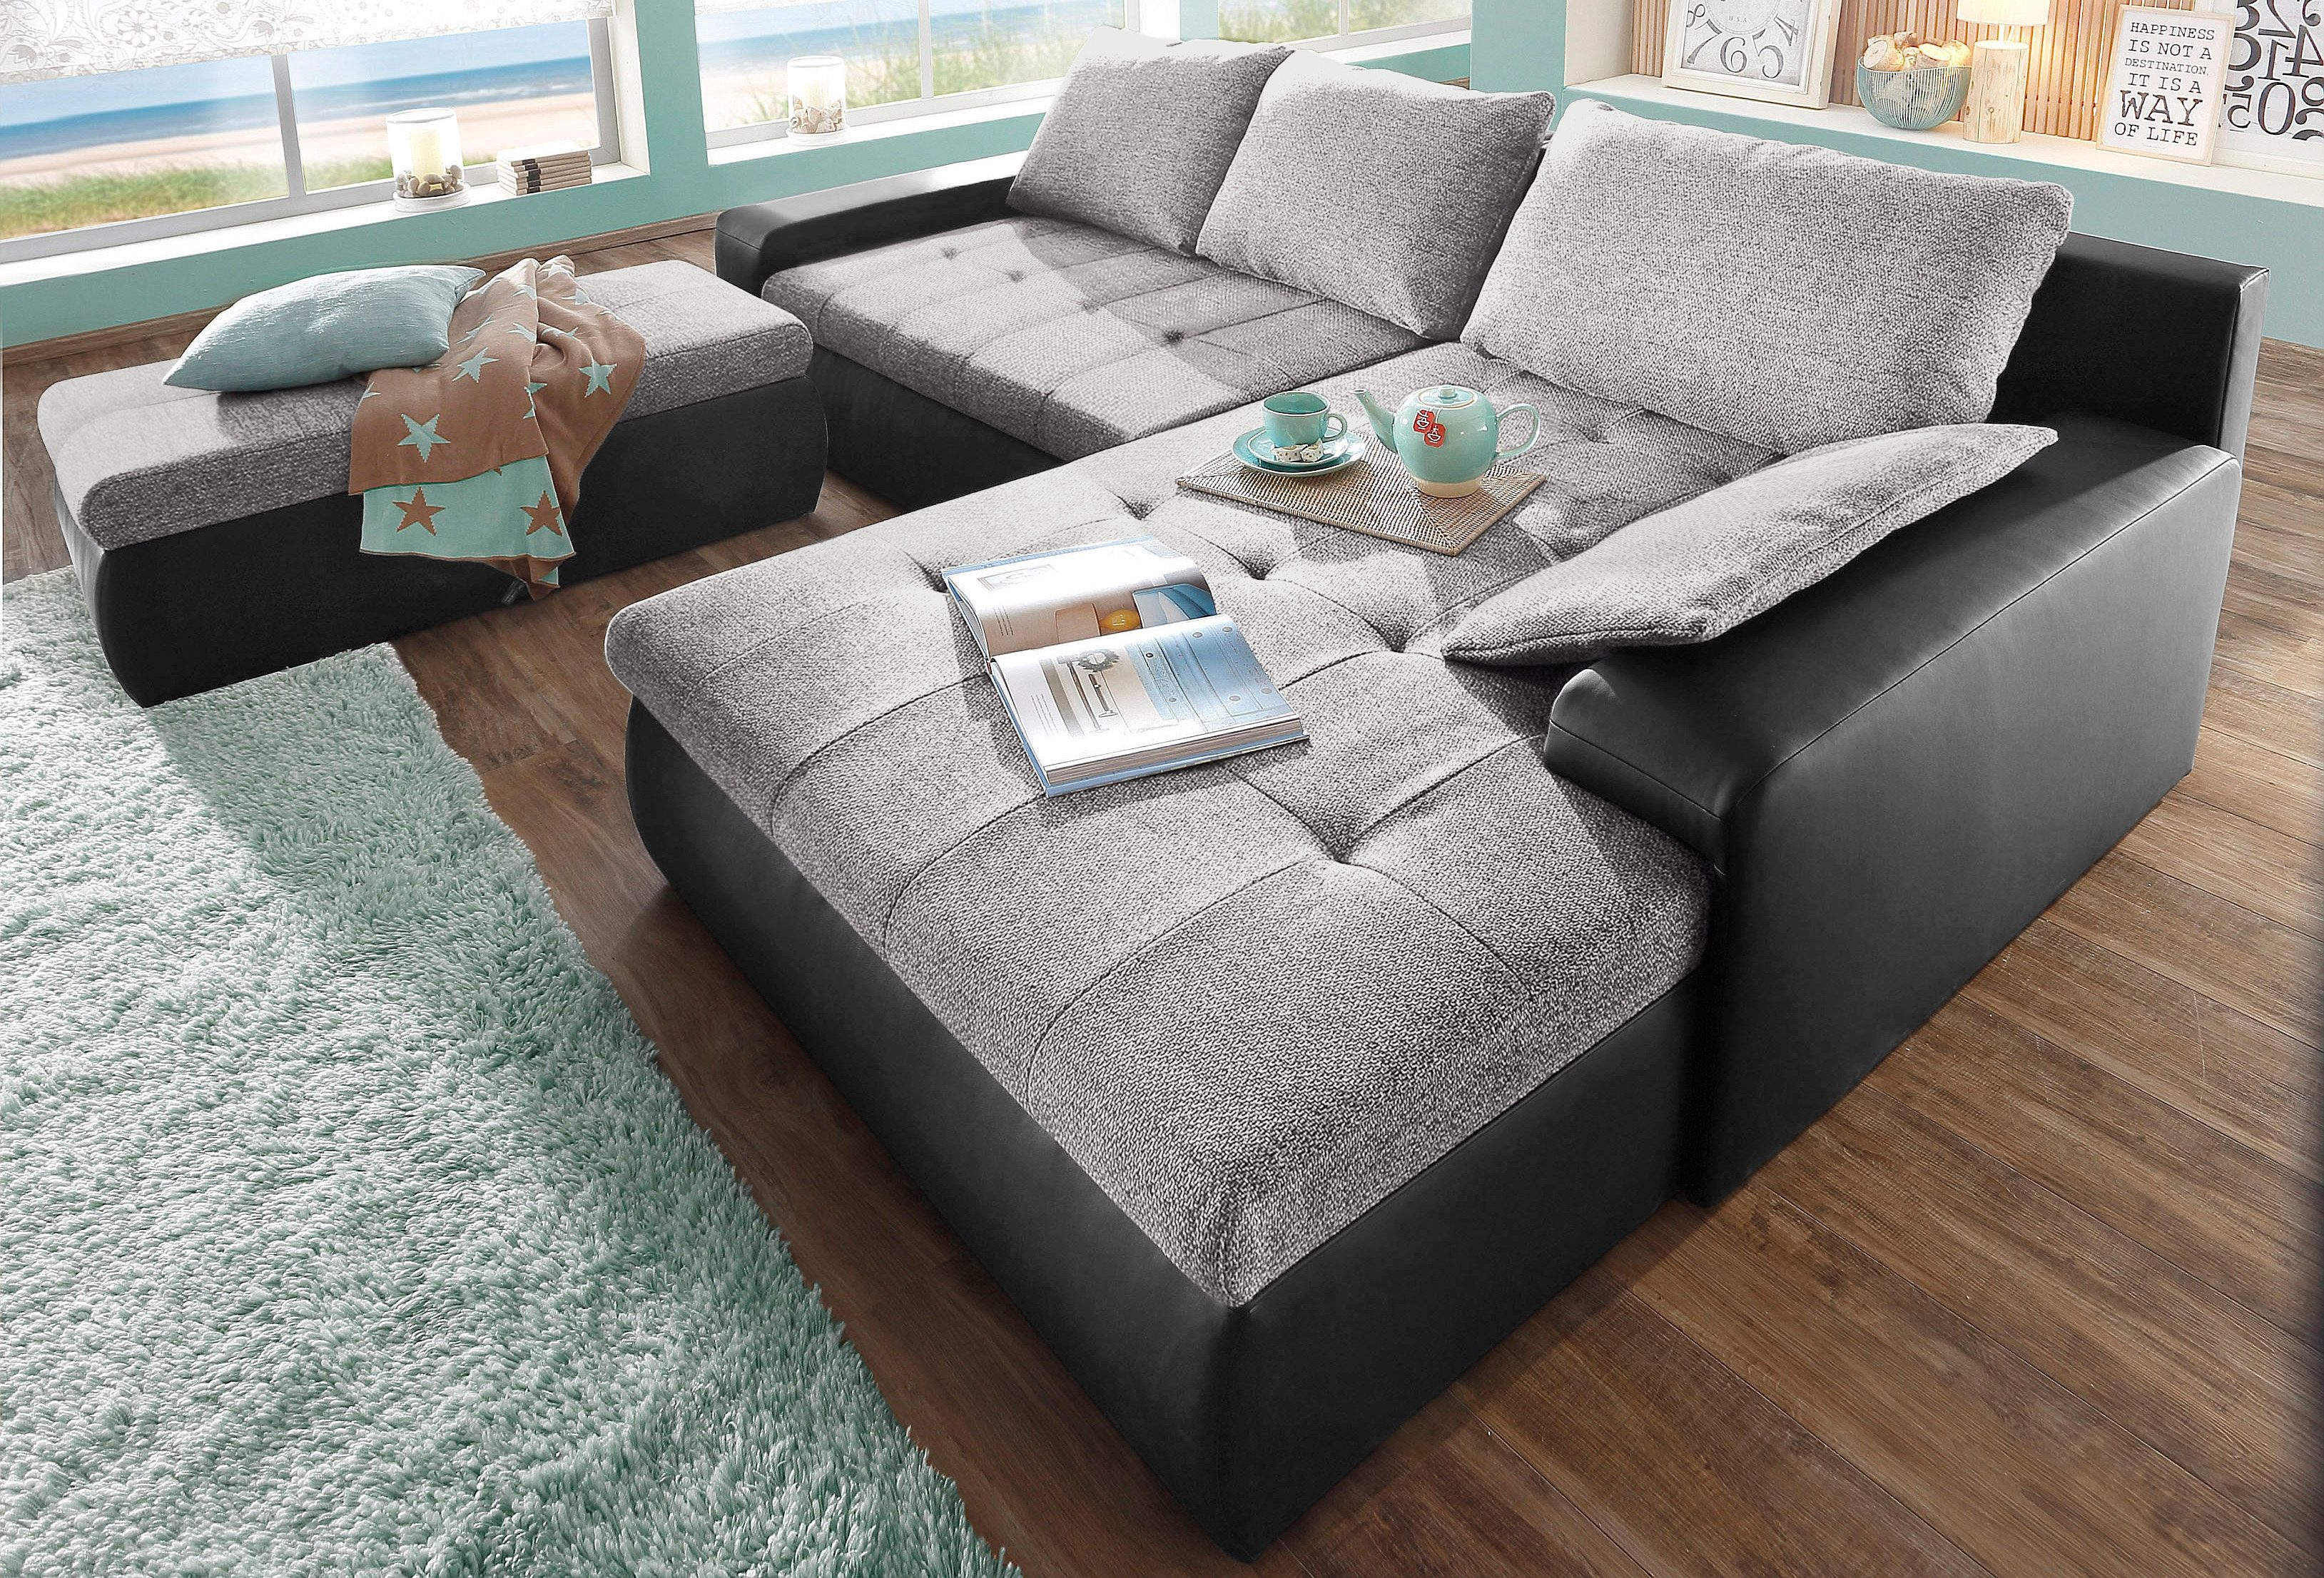 50 sparen sit more polsterecke xl xxl ab 499 99. Black Bedroom Furniture Sets. Home Design Ideas